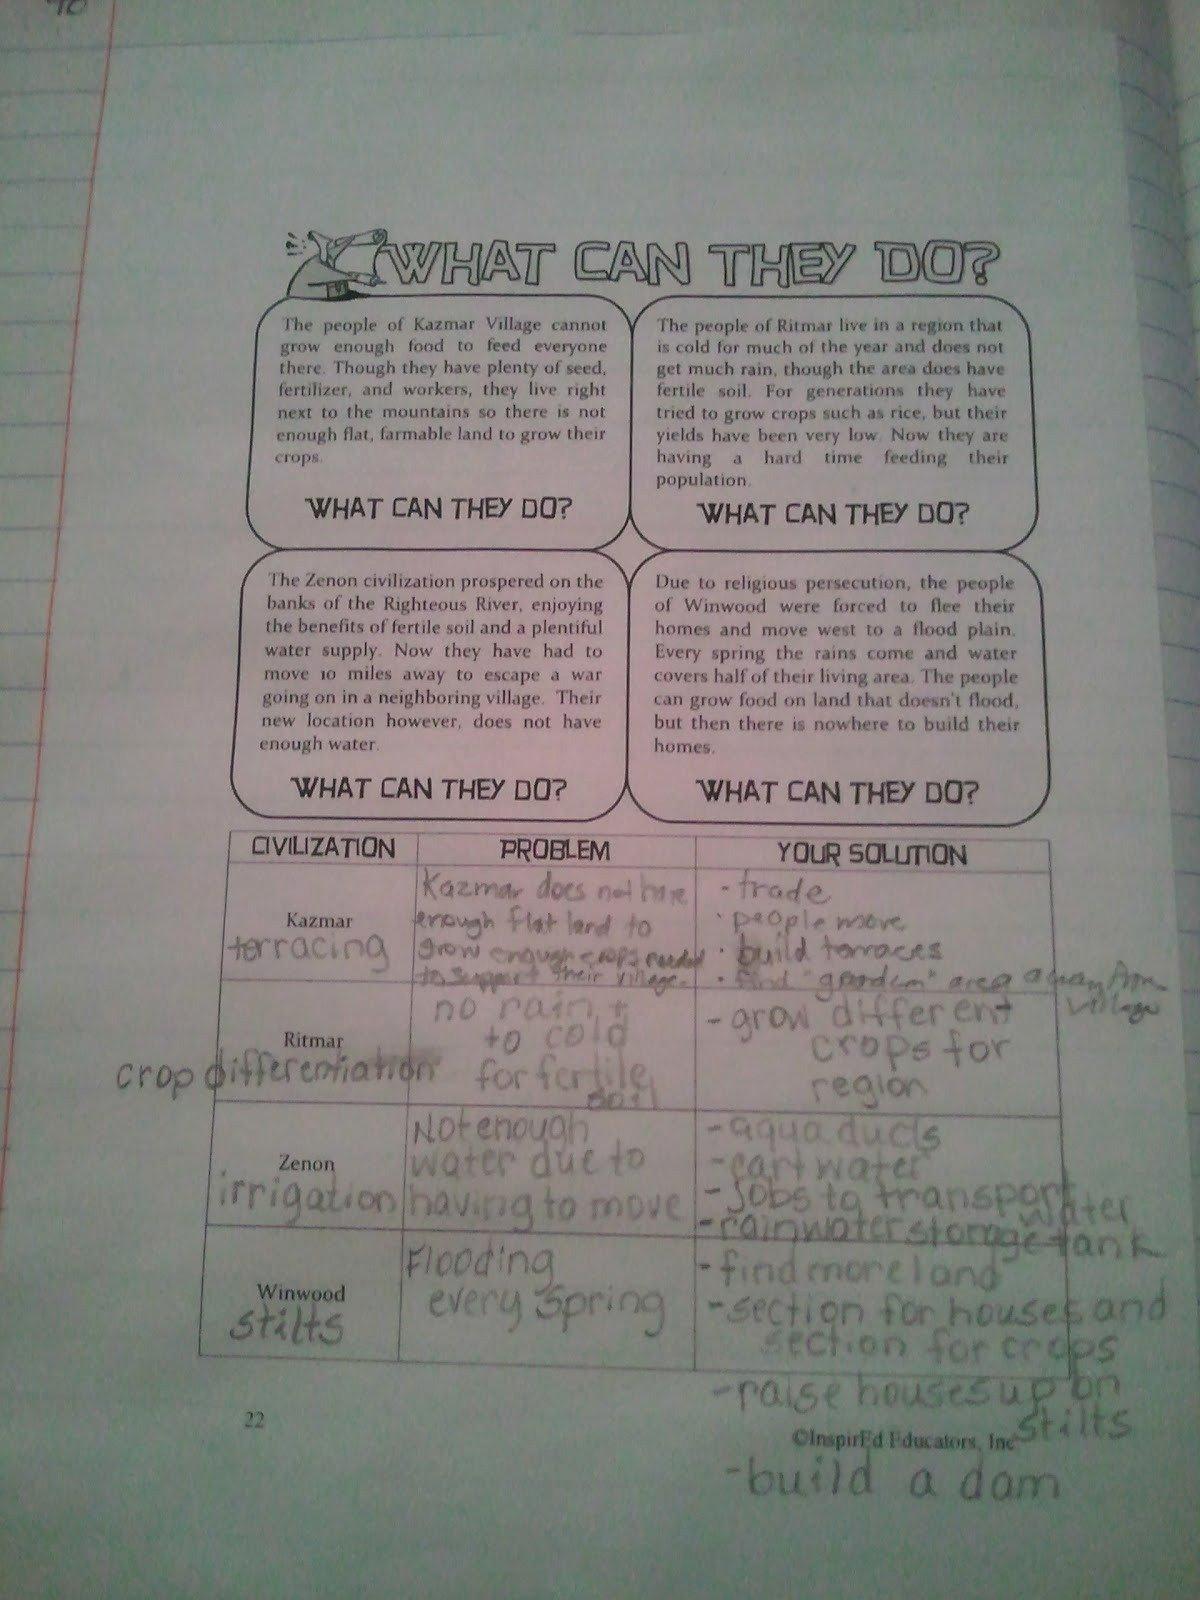 Inspired Educators Inc Worksheet Answers Inspirational Inspired Educators Inc Worksheet Answers